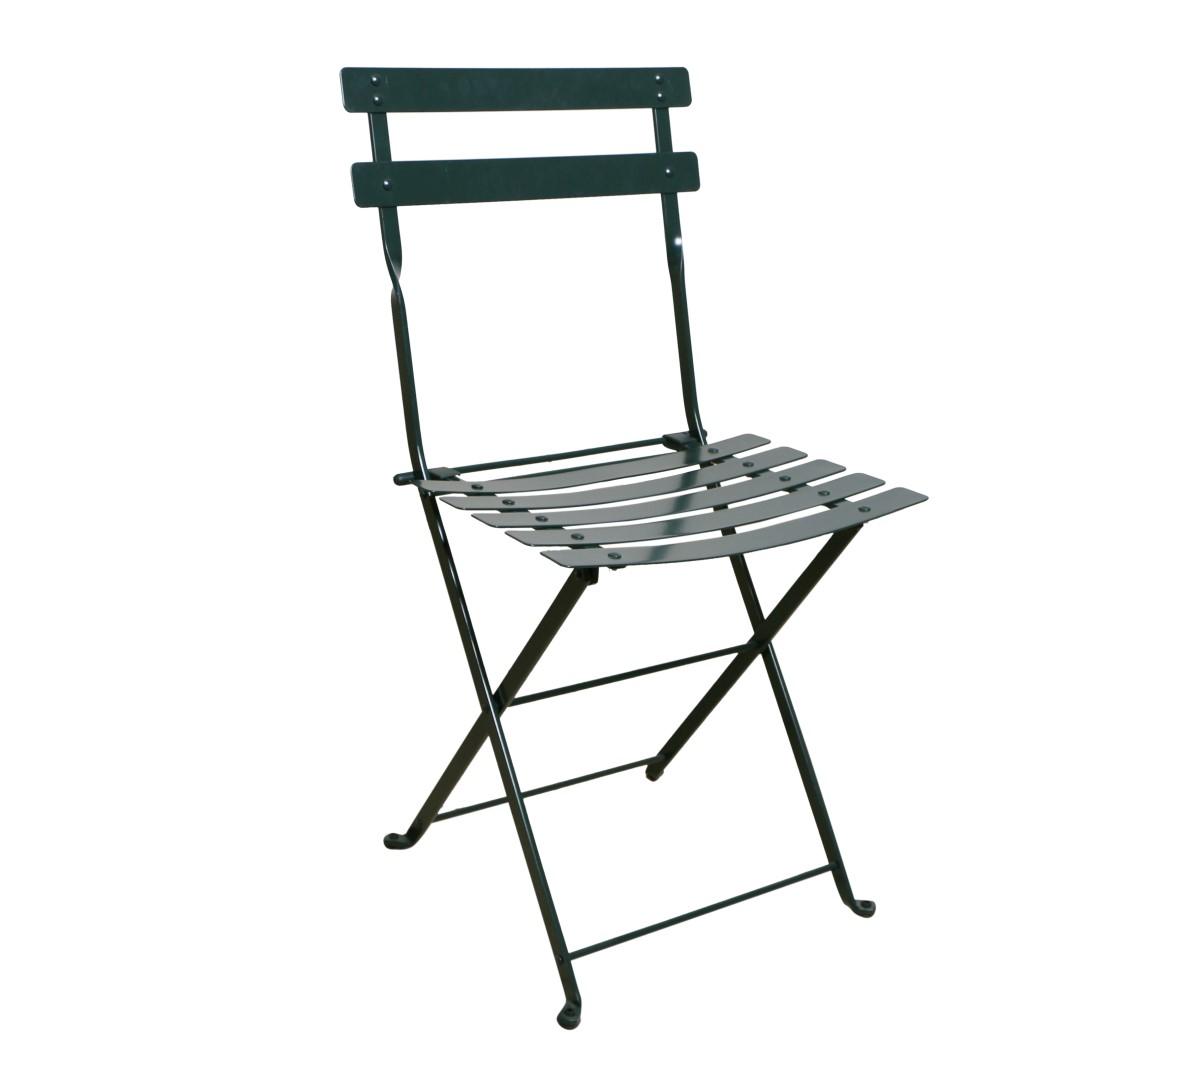 Paris Cafe Chair 5517S-GR - Black Green